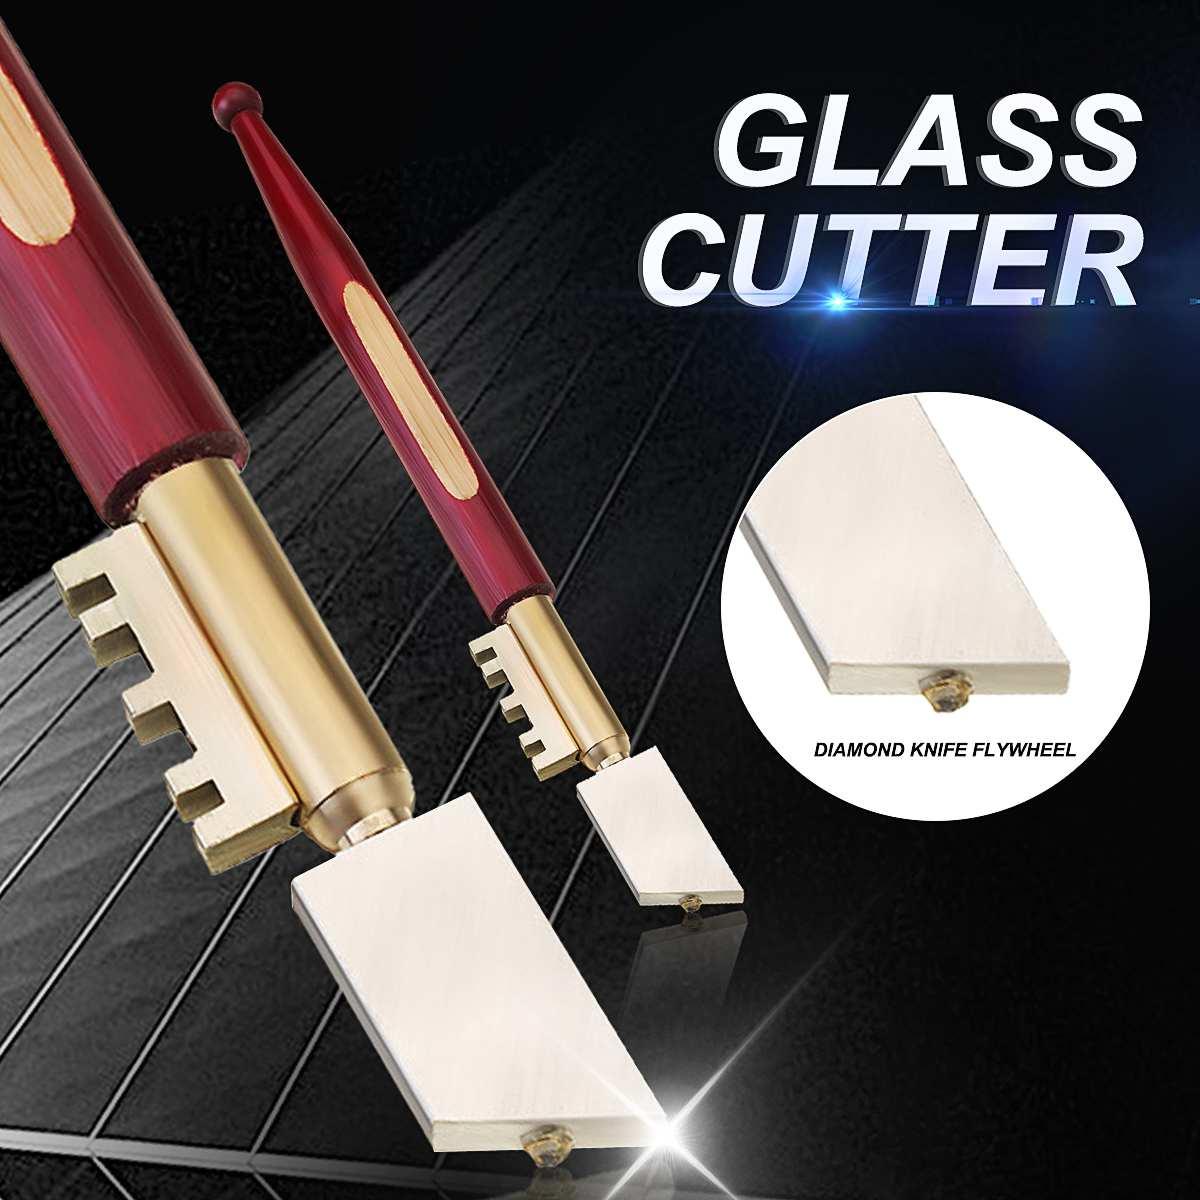 Doersupp Portable Glass Cutter Self-Lubricating Carbide Wheel Blade Diamond Tip Glass Cutter Knife Wooden Handle Tool